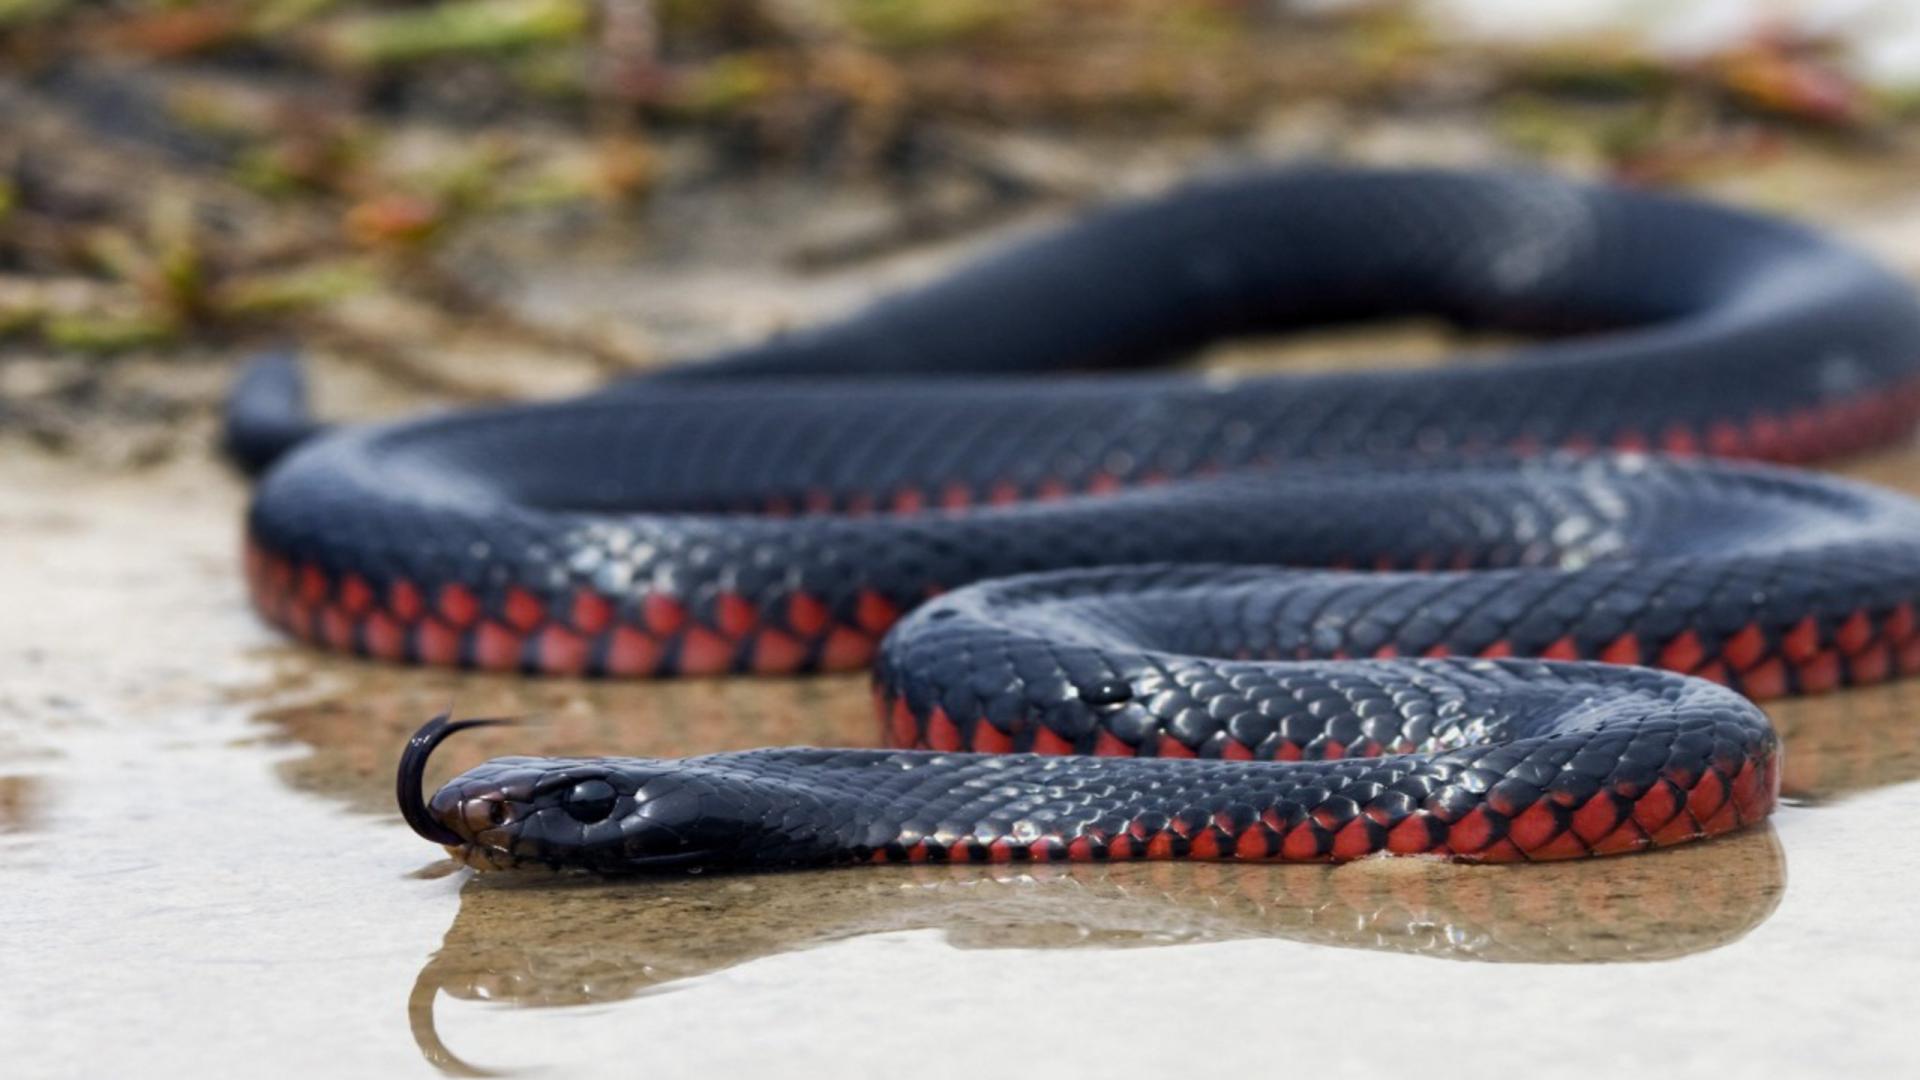 мамба африканская красная змея